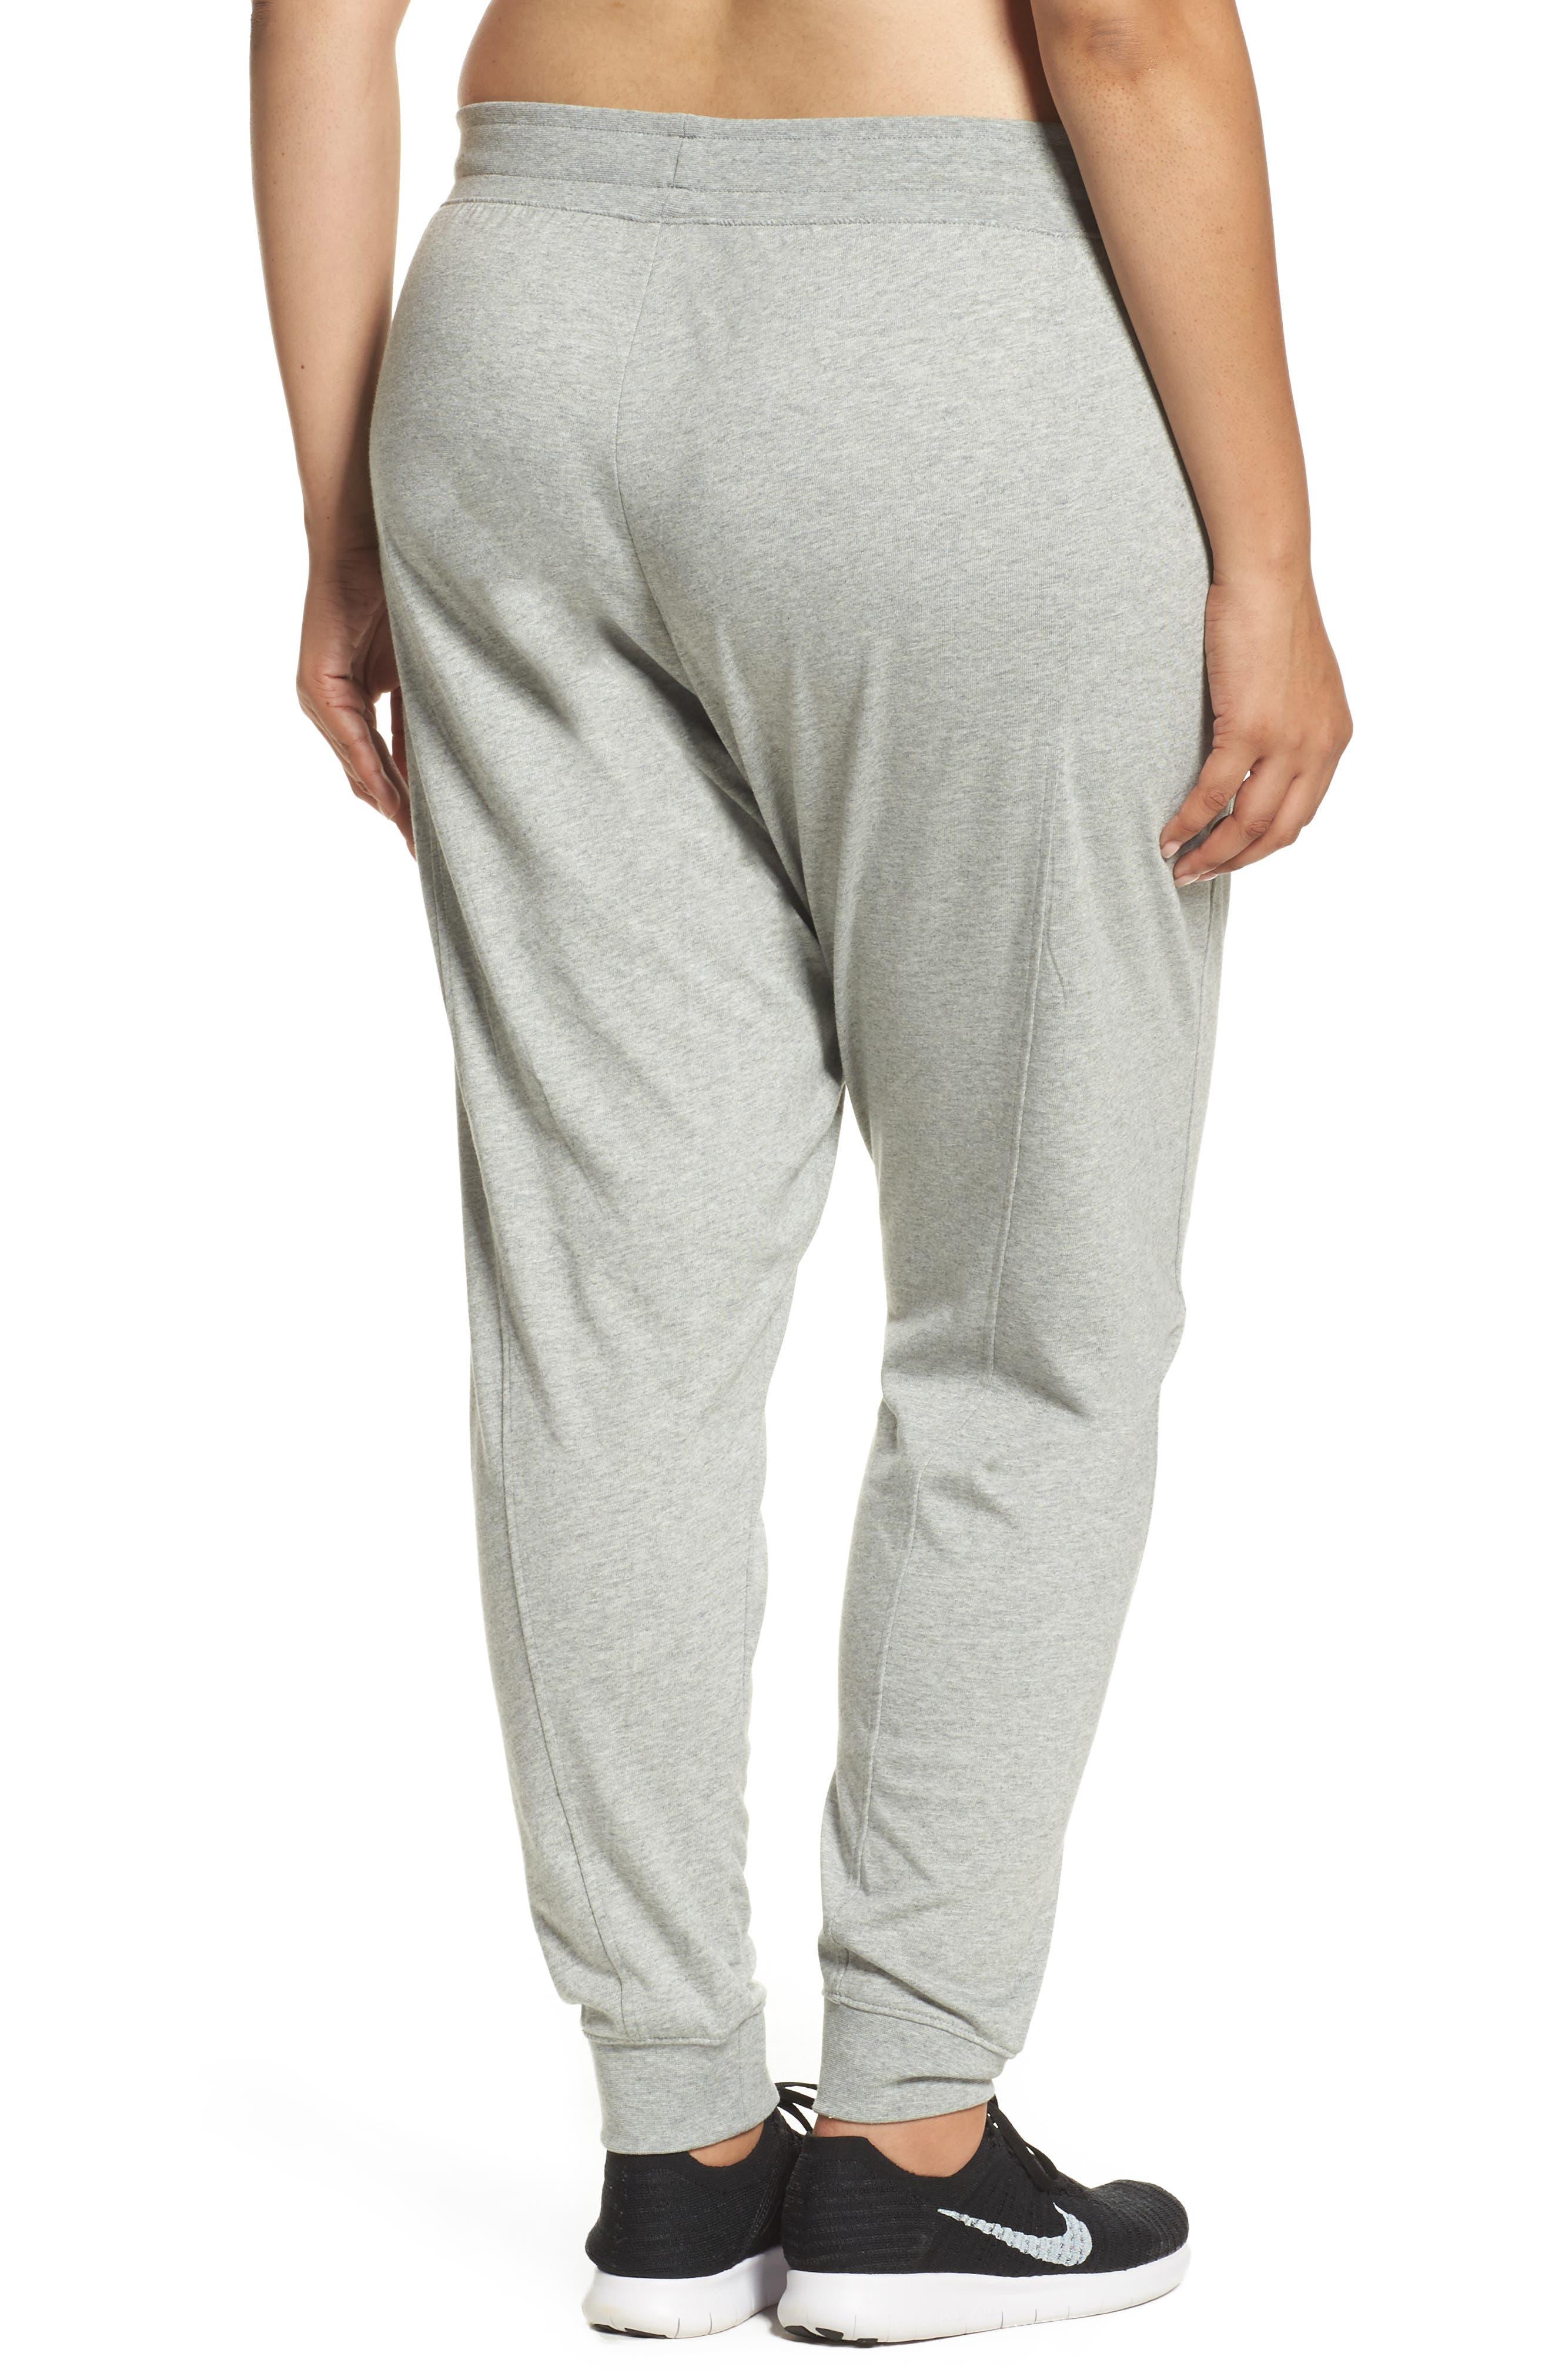 Sportswear Gym Classic Pants,                             Alternate thumbnail 2, color,                             Dk Grey Heather/ Sail